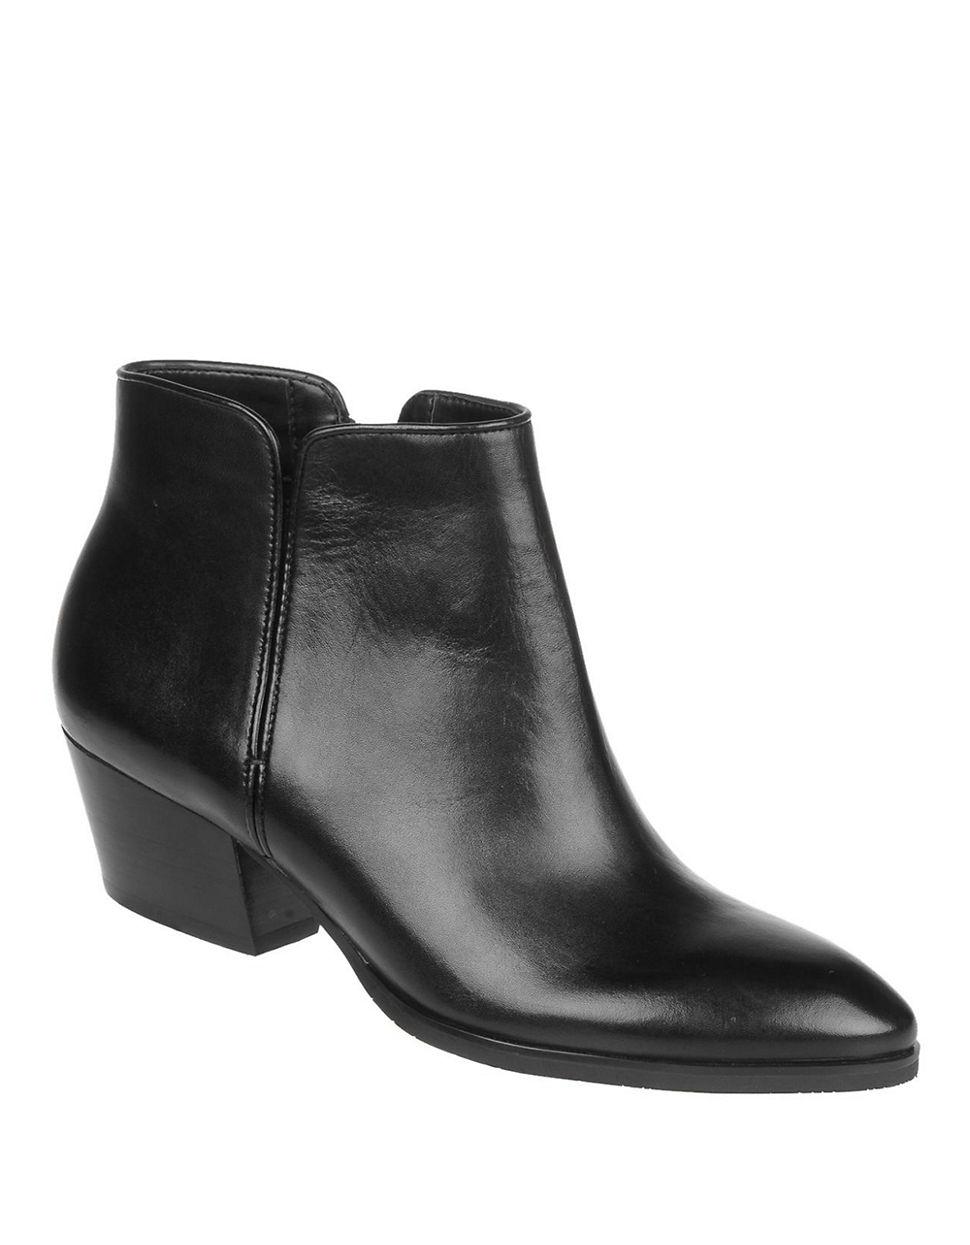 franco sarto quasar leather boots in black lyst